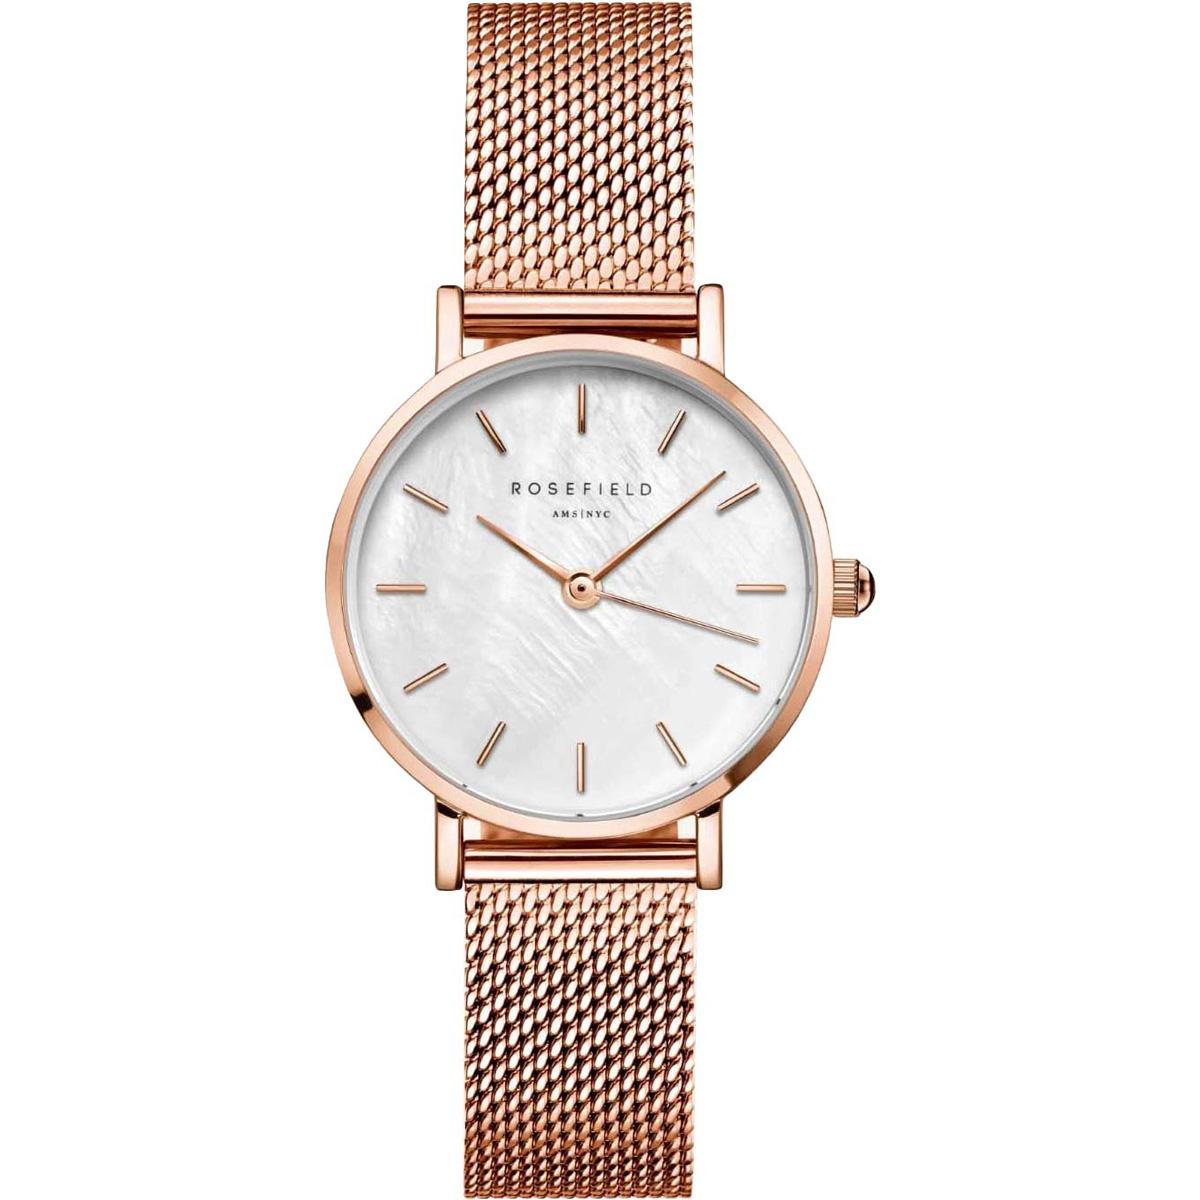 275c47e0 Часы Rosefield 26WR-265 - купить женские наручные часы в Bestwatch.ru